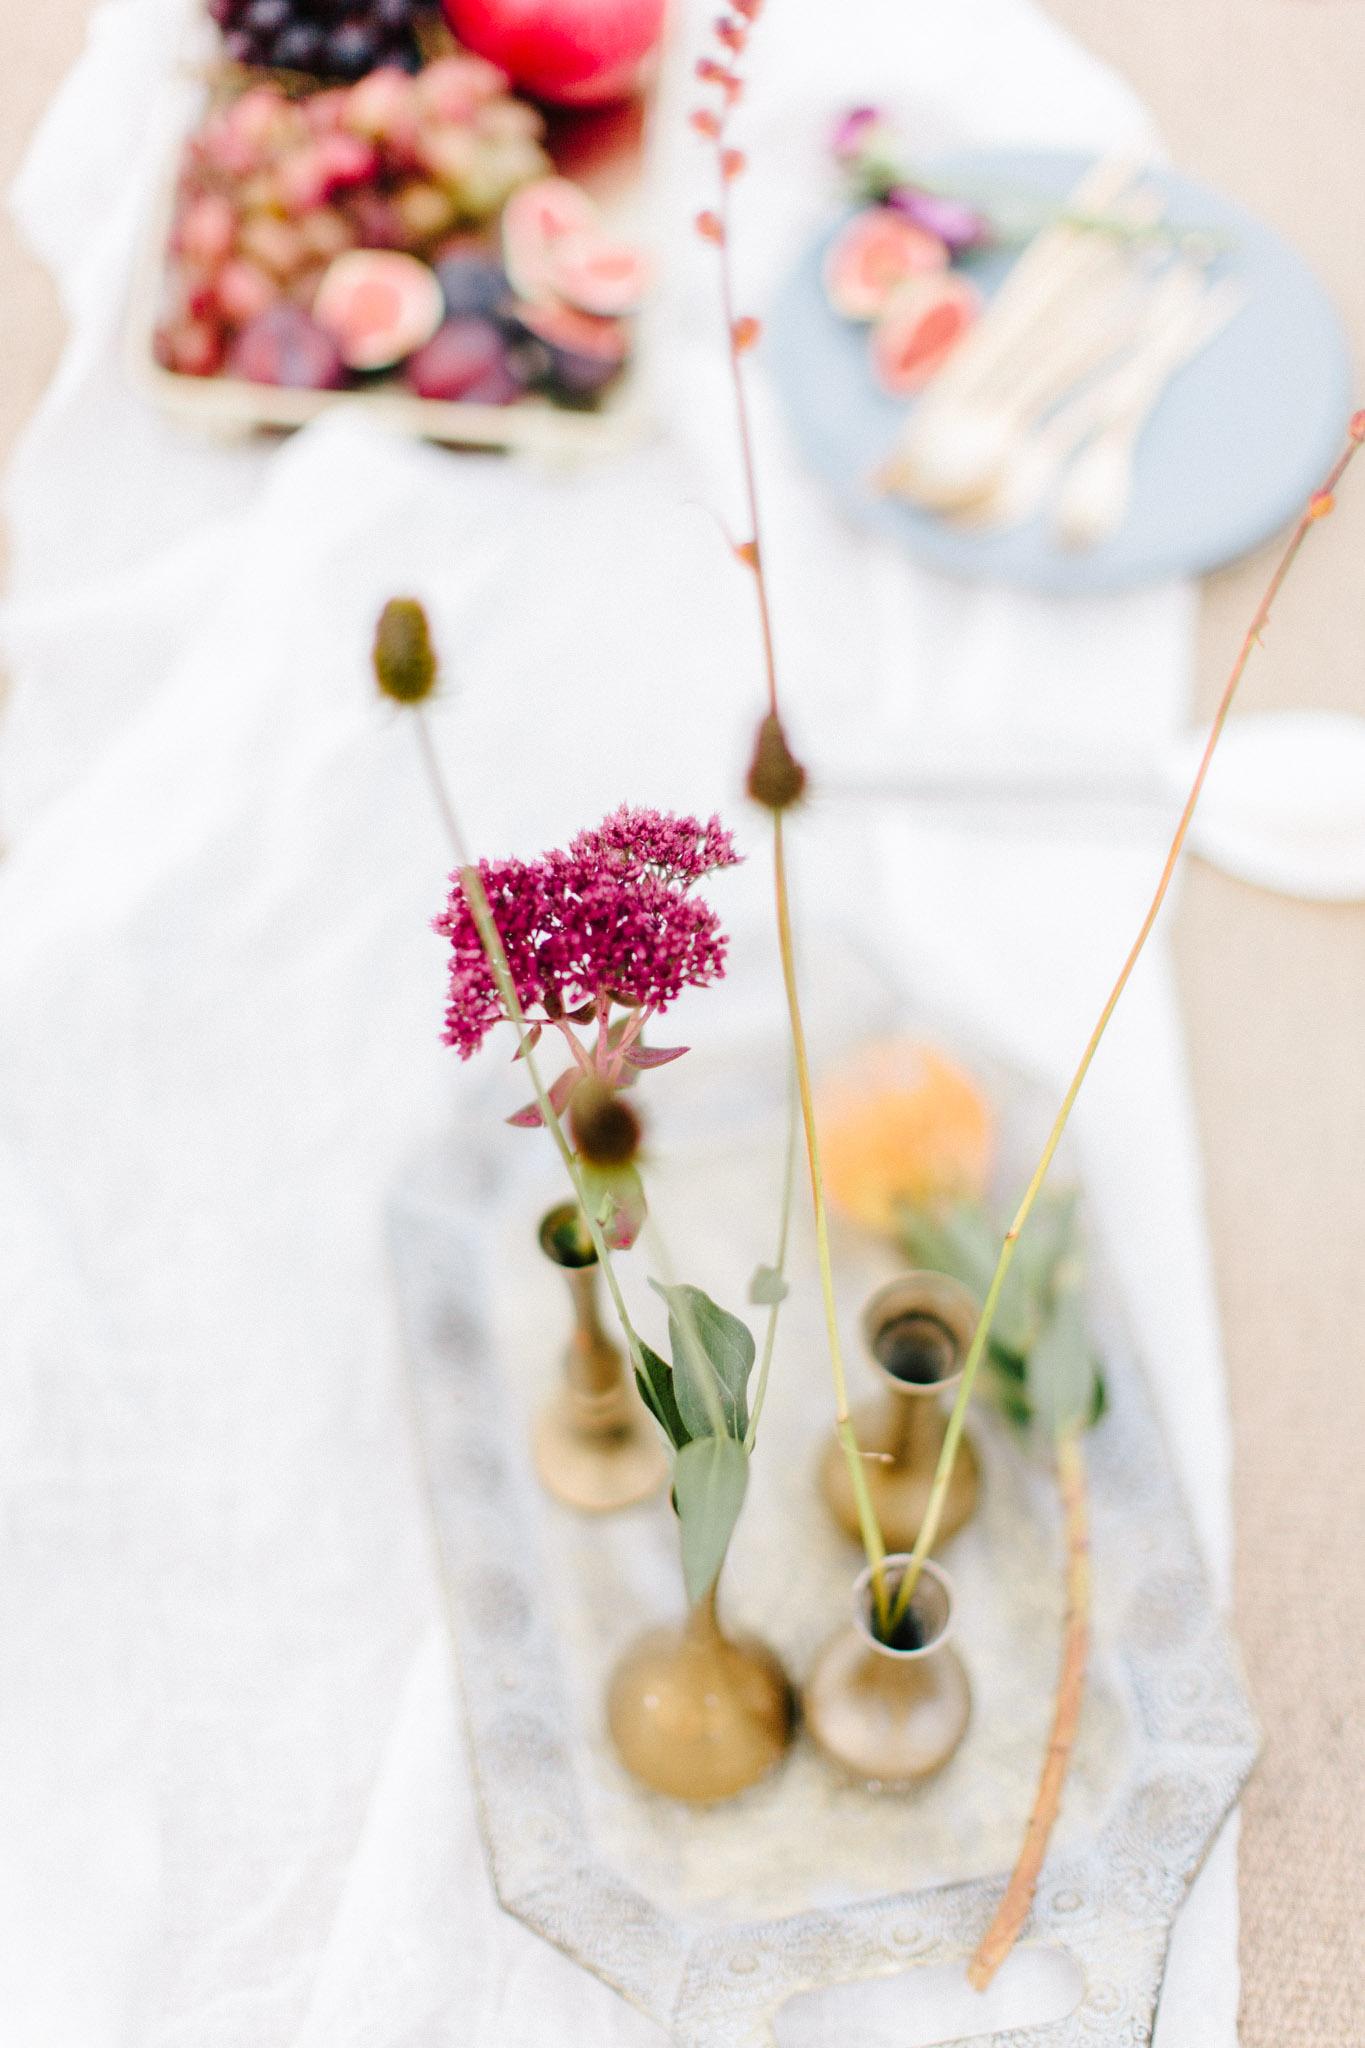 Speyer-Moroccan-Wedding-Inspiration-Pia-Anna-Christian-Wedding-Photography-S-42.jpg